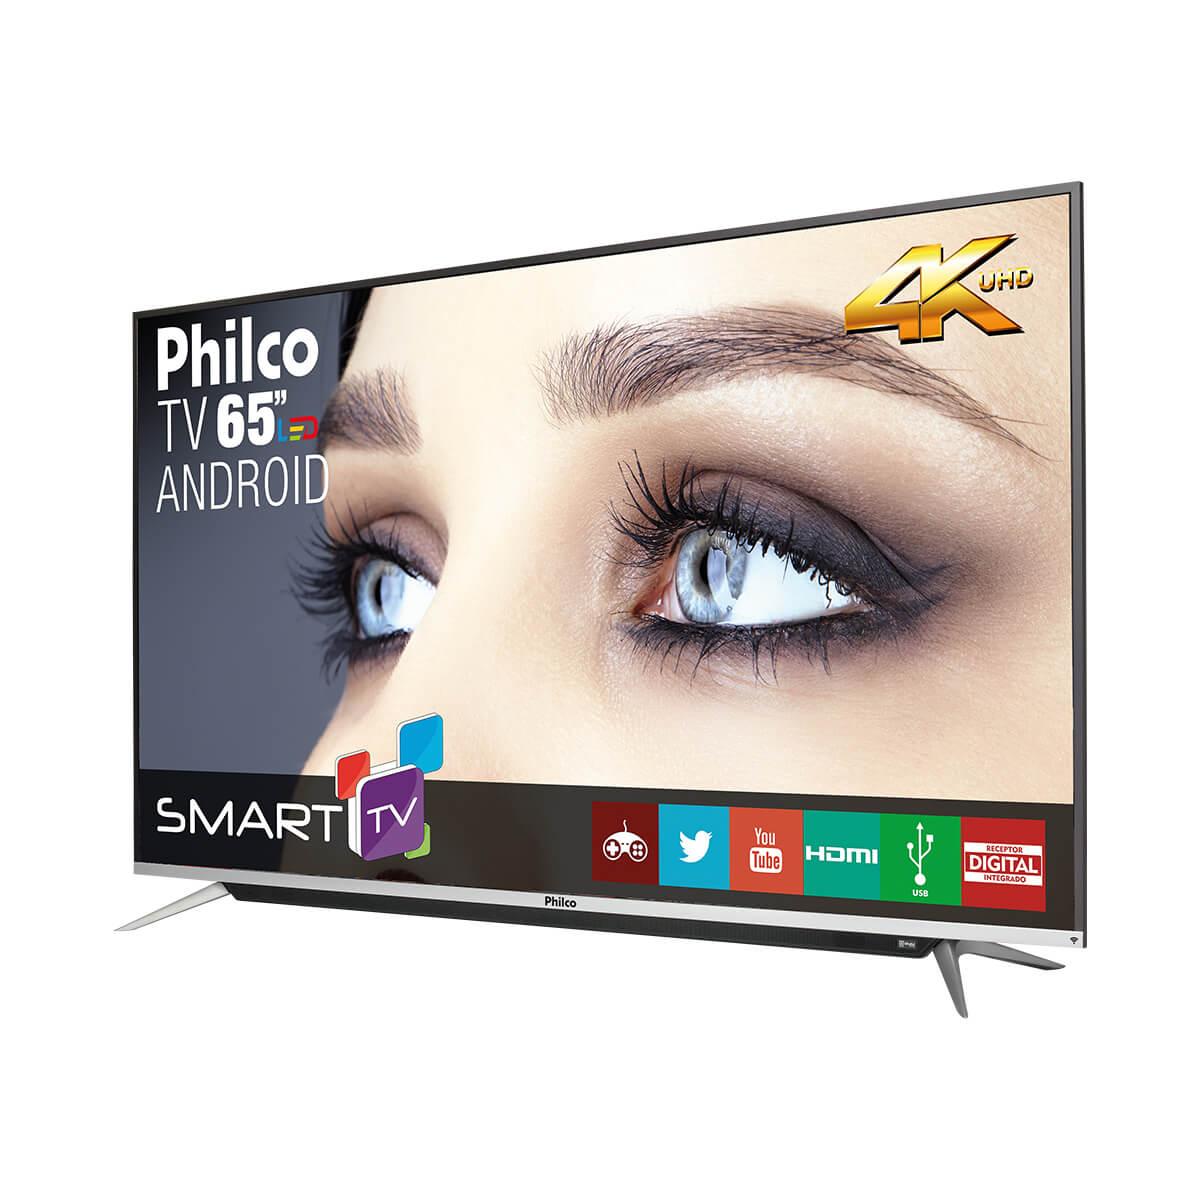 Android TV 65'' Smart 4K PH65G60DSGWAG Philco